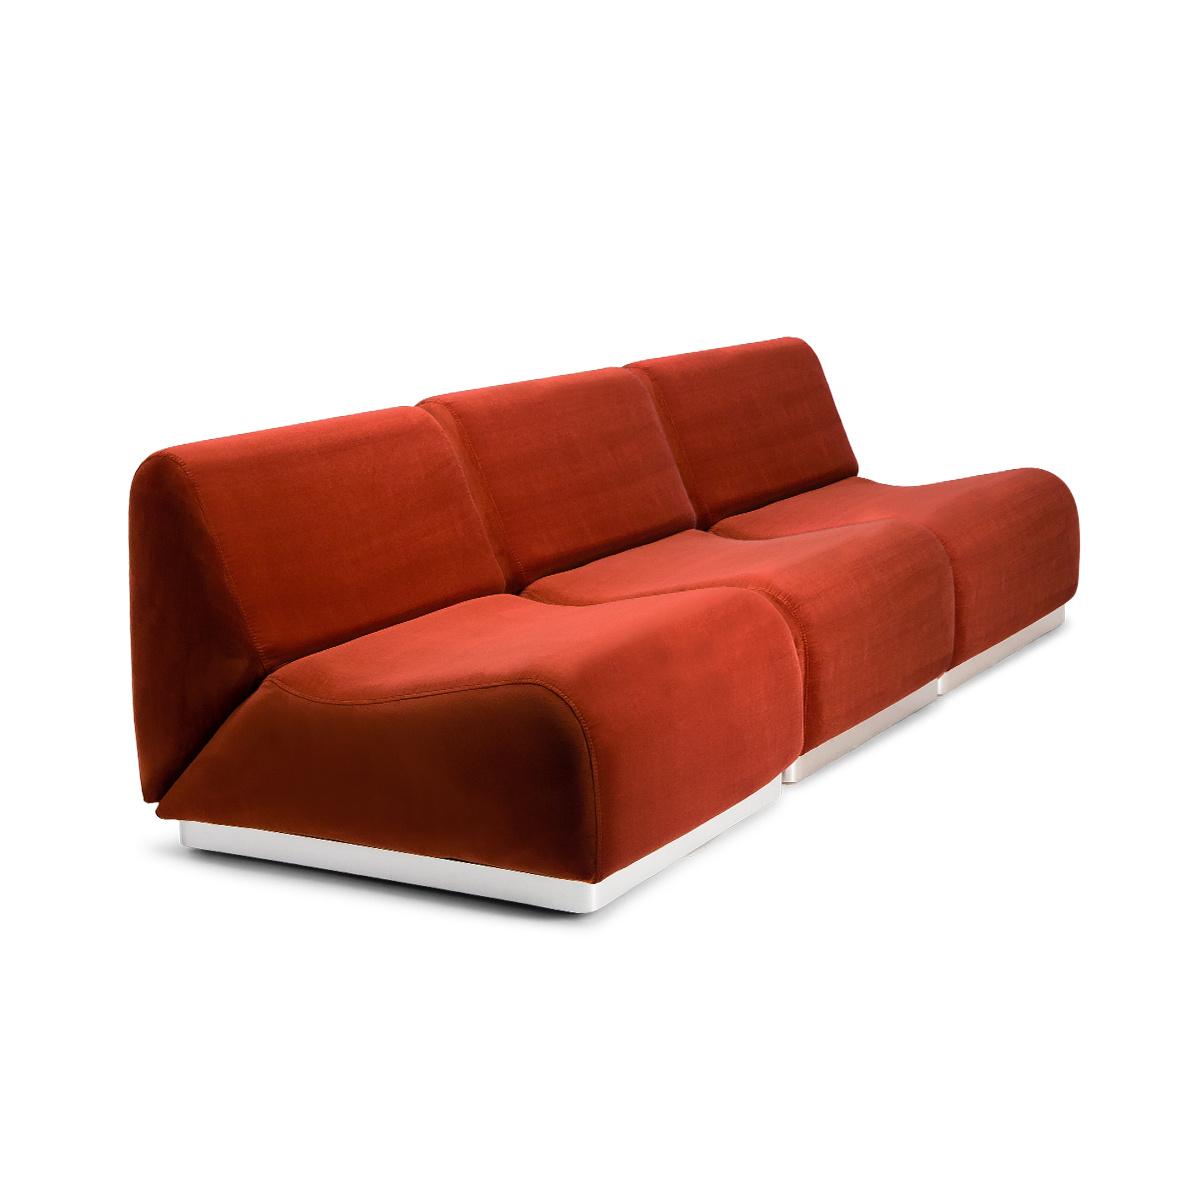 Rotondo Modular Sofa in Terracotta Velvet